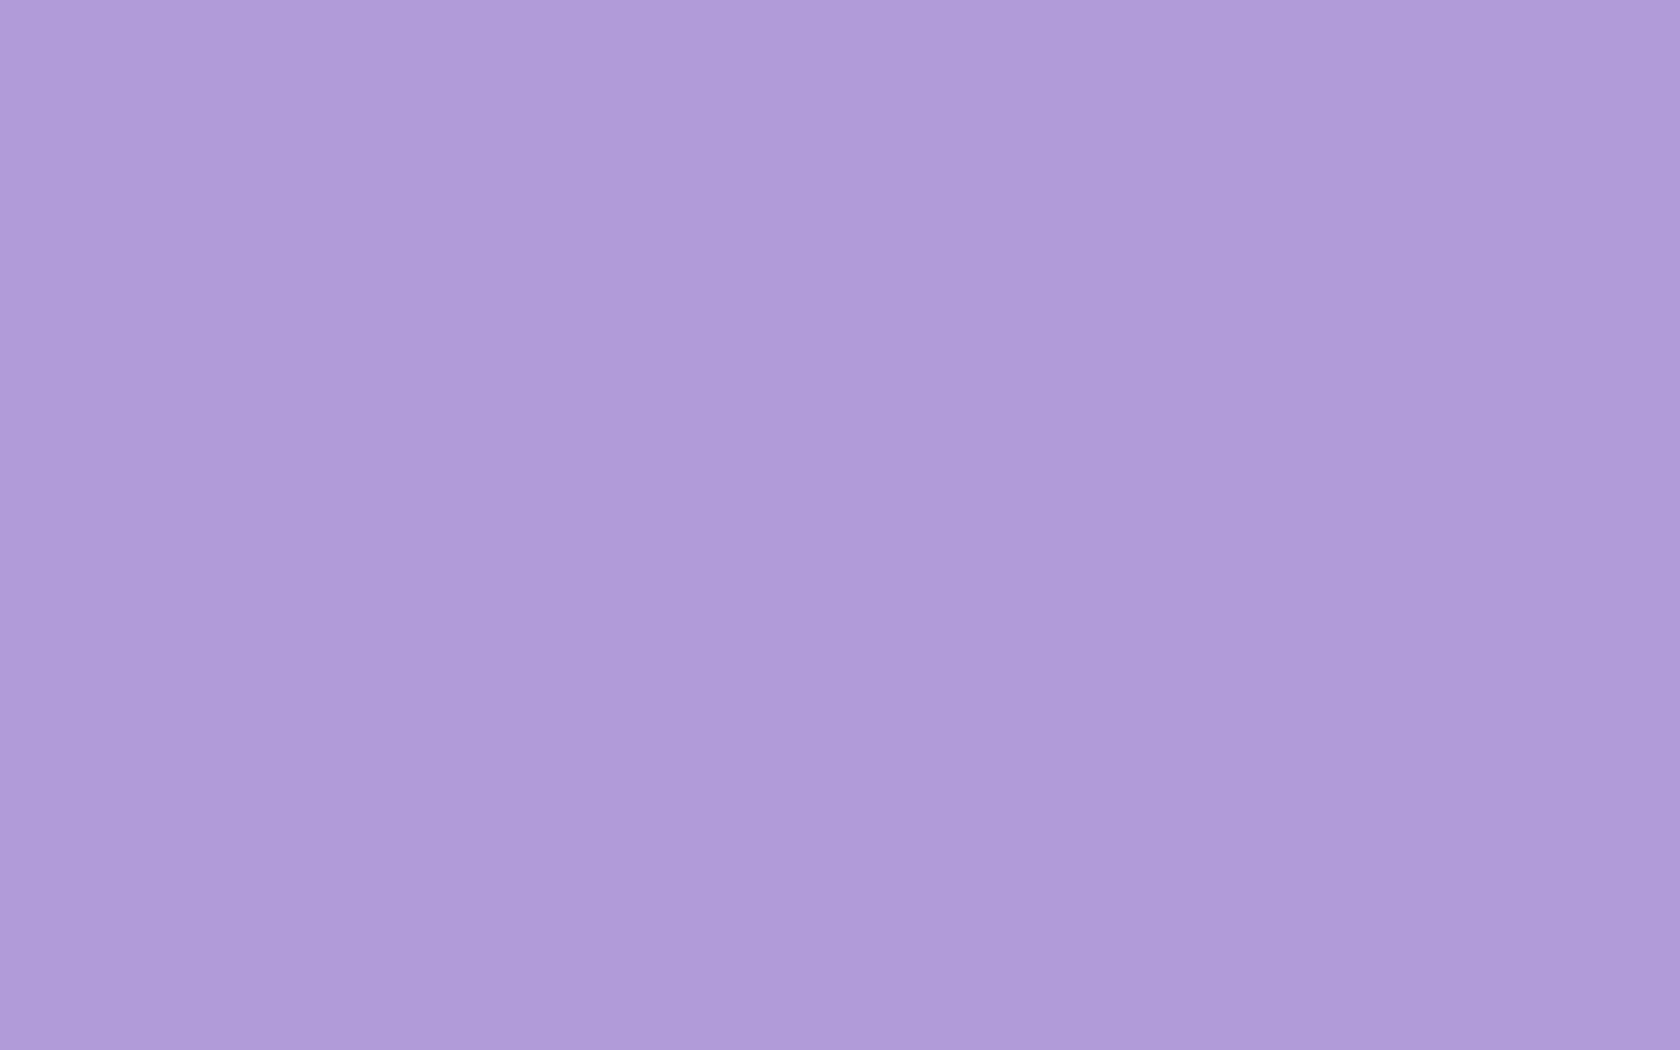 1680x1050 Light Pastel Purple Solid Color Background